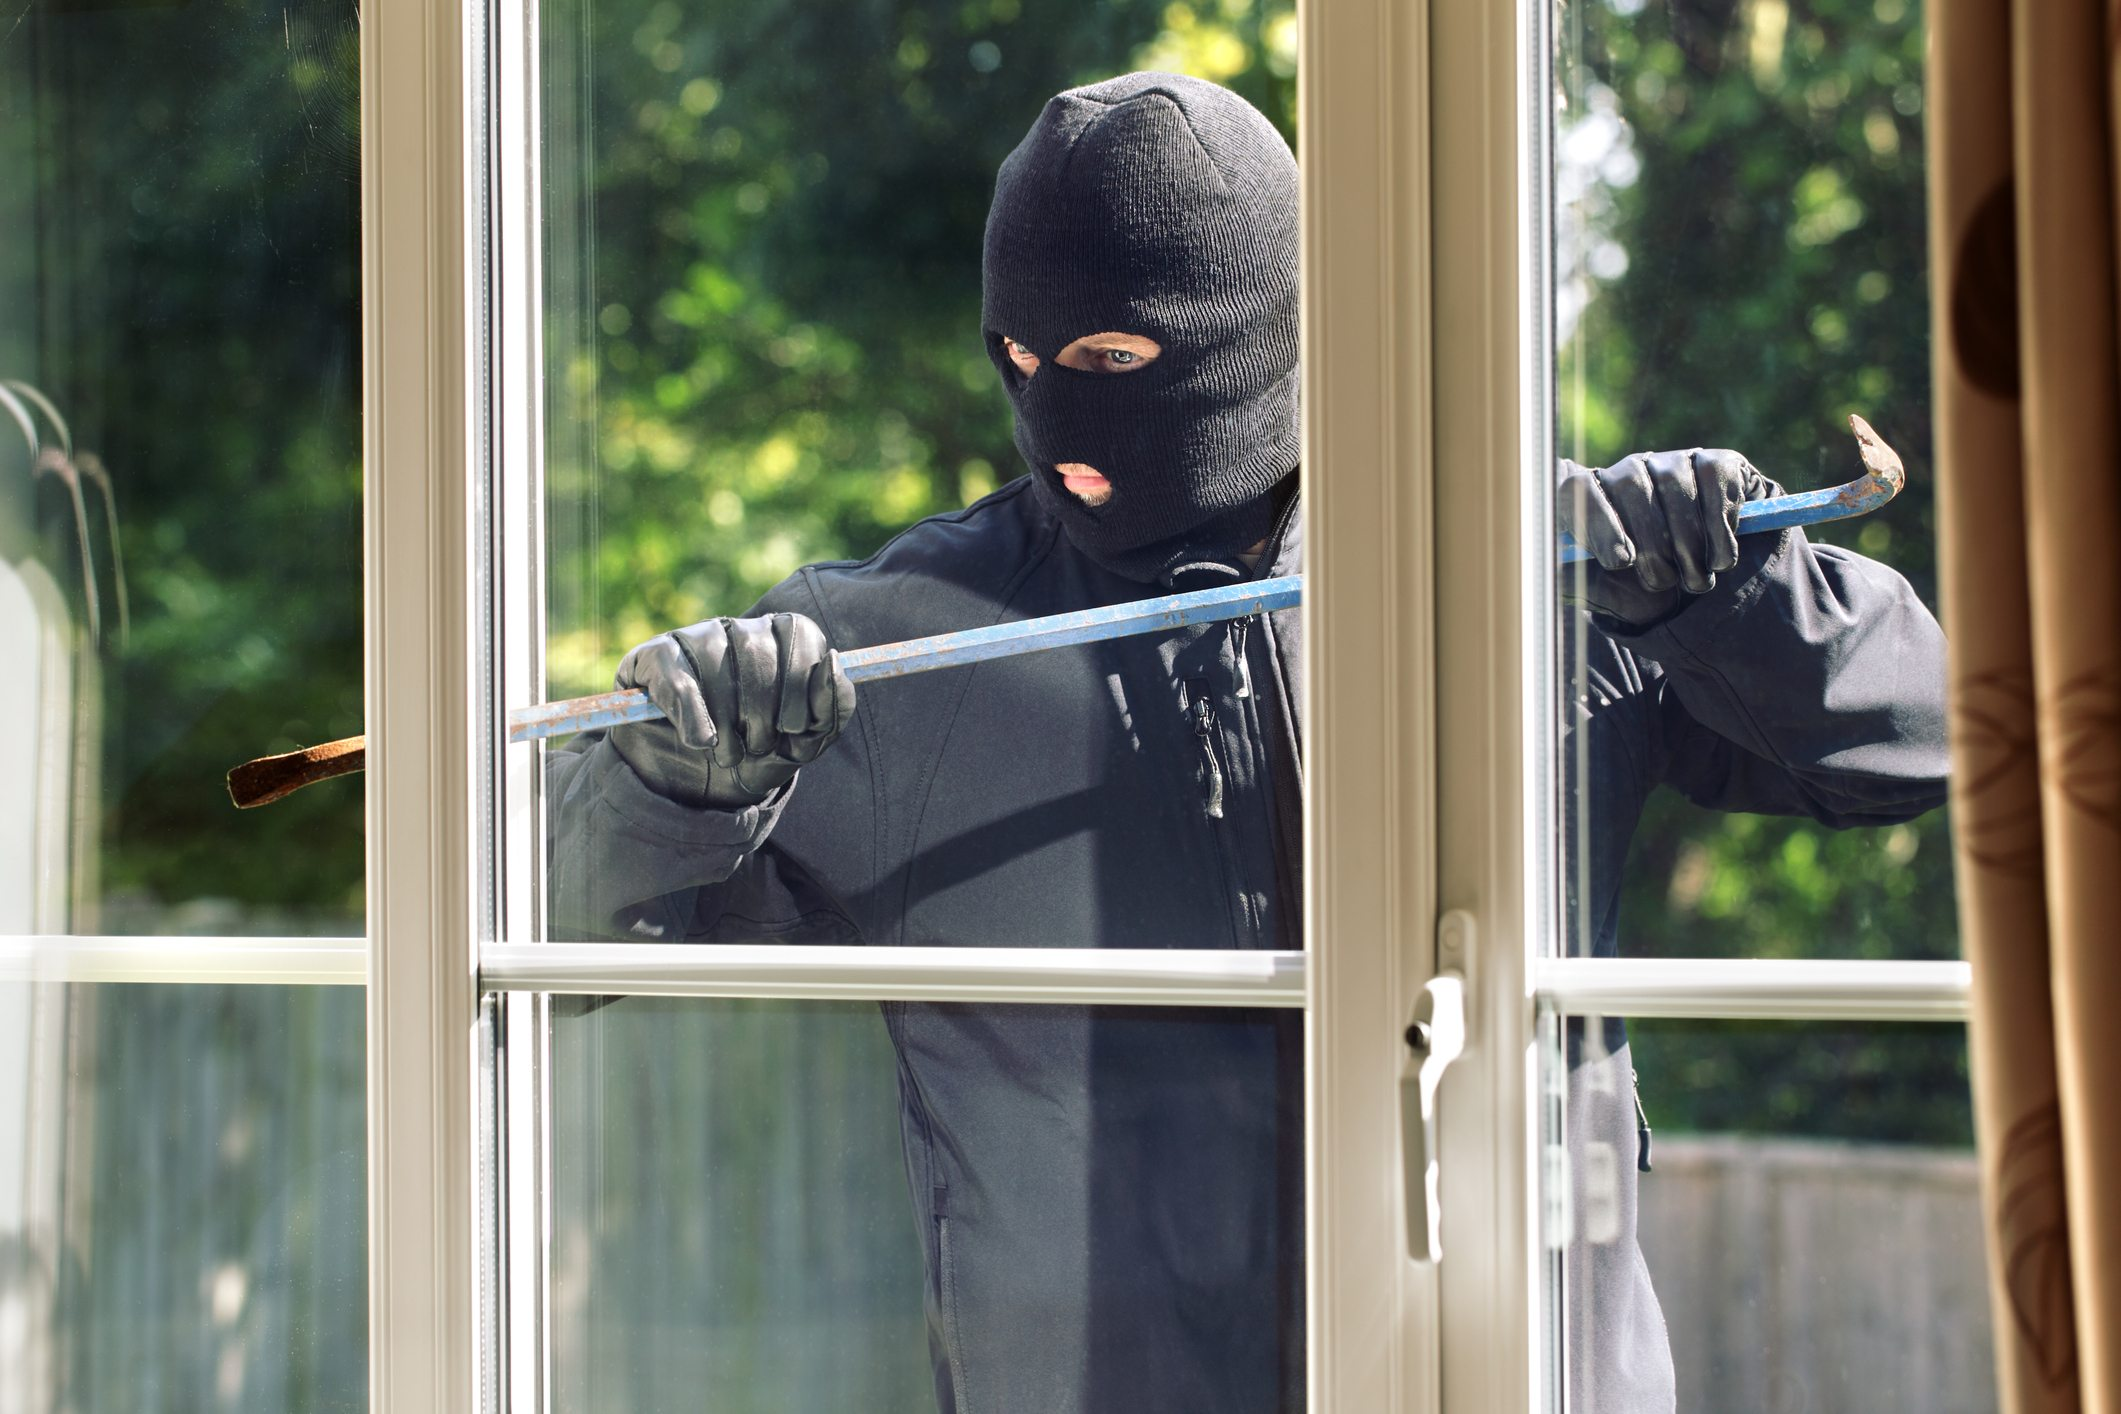 Burglar breaking into a house via a window with a crowbar